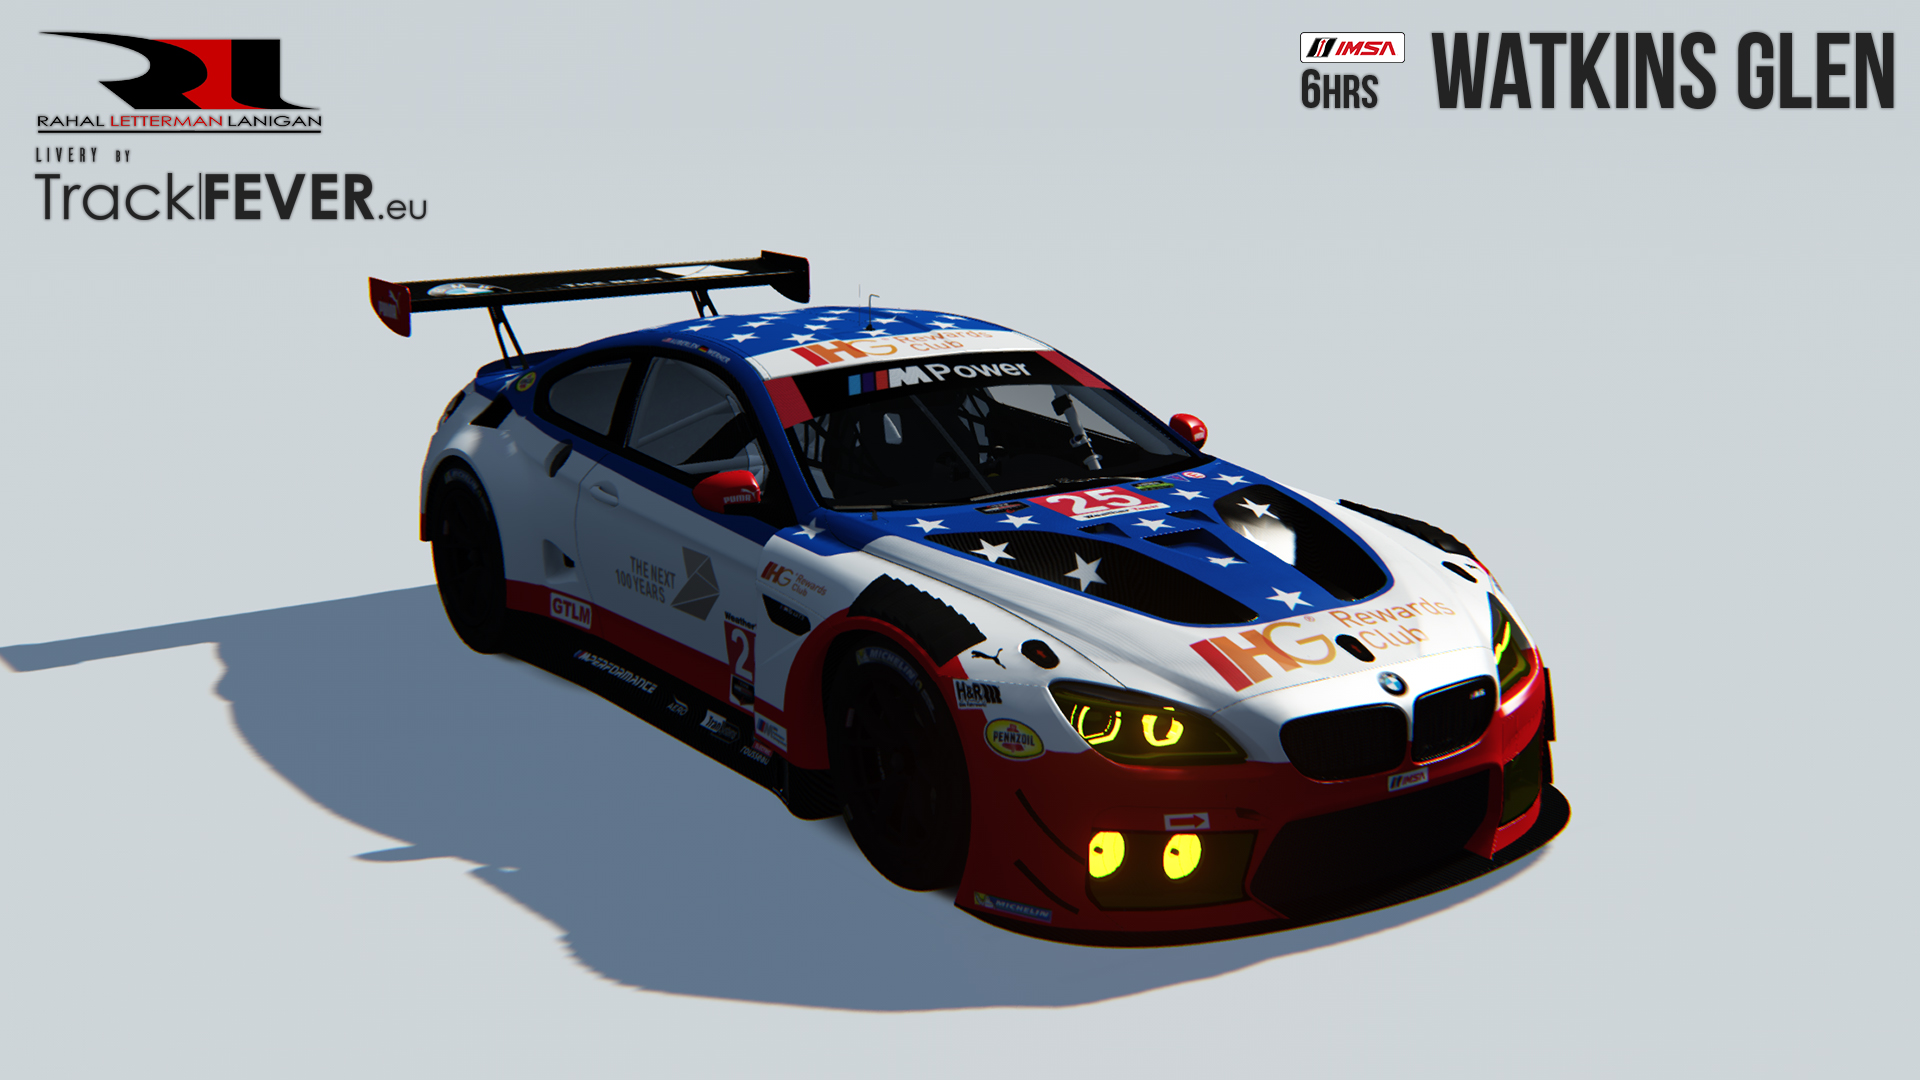 BMW_Livrea.jpg